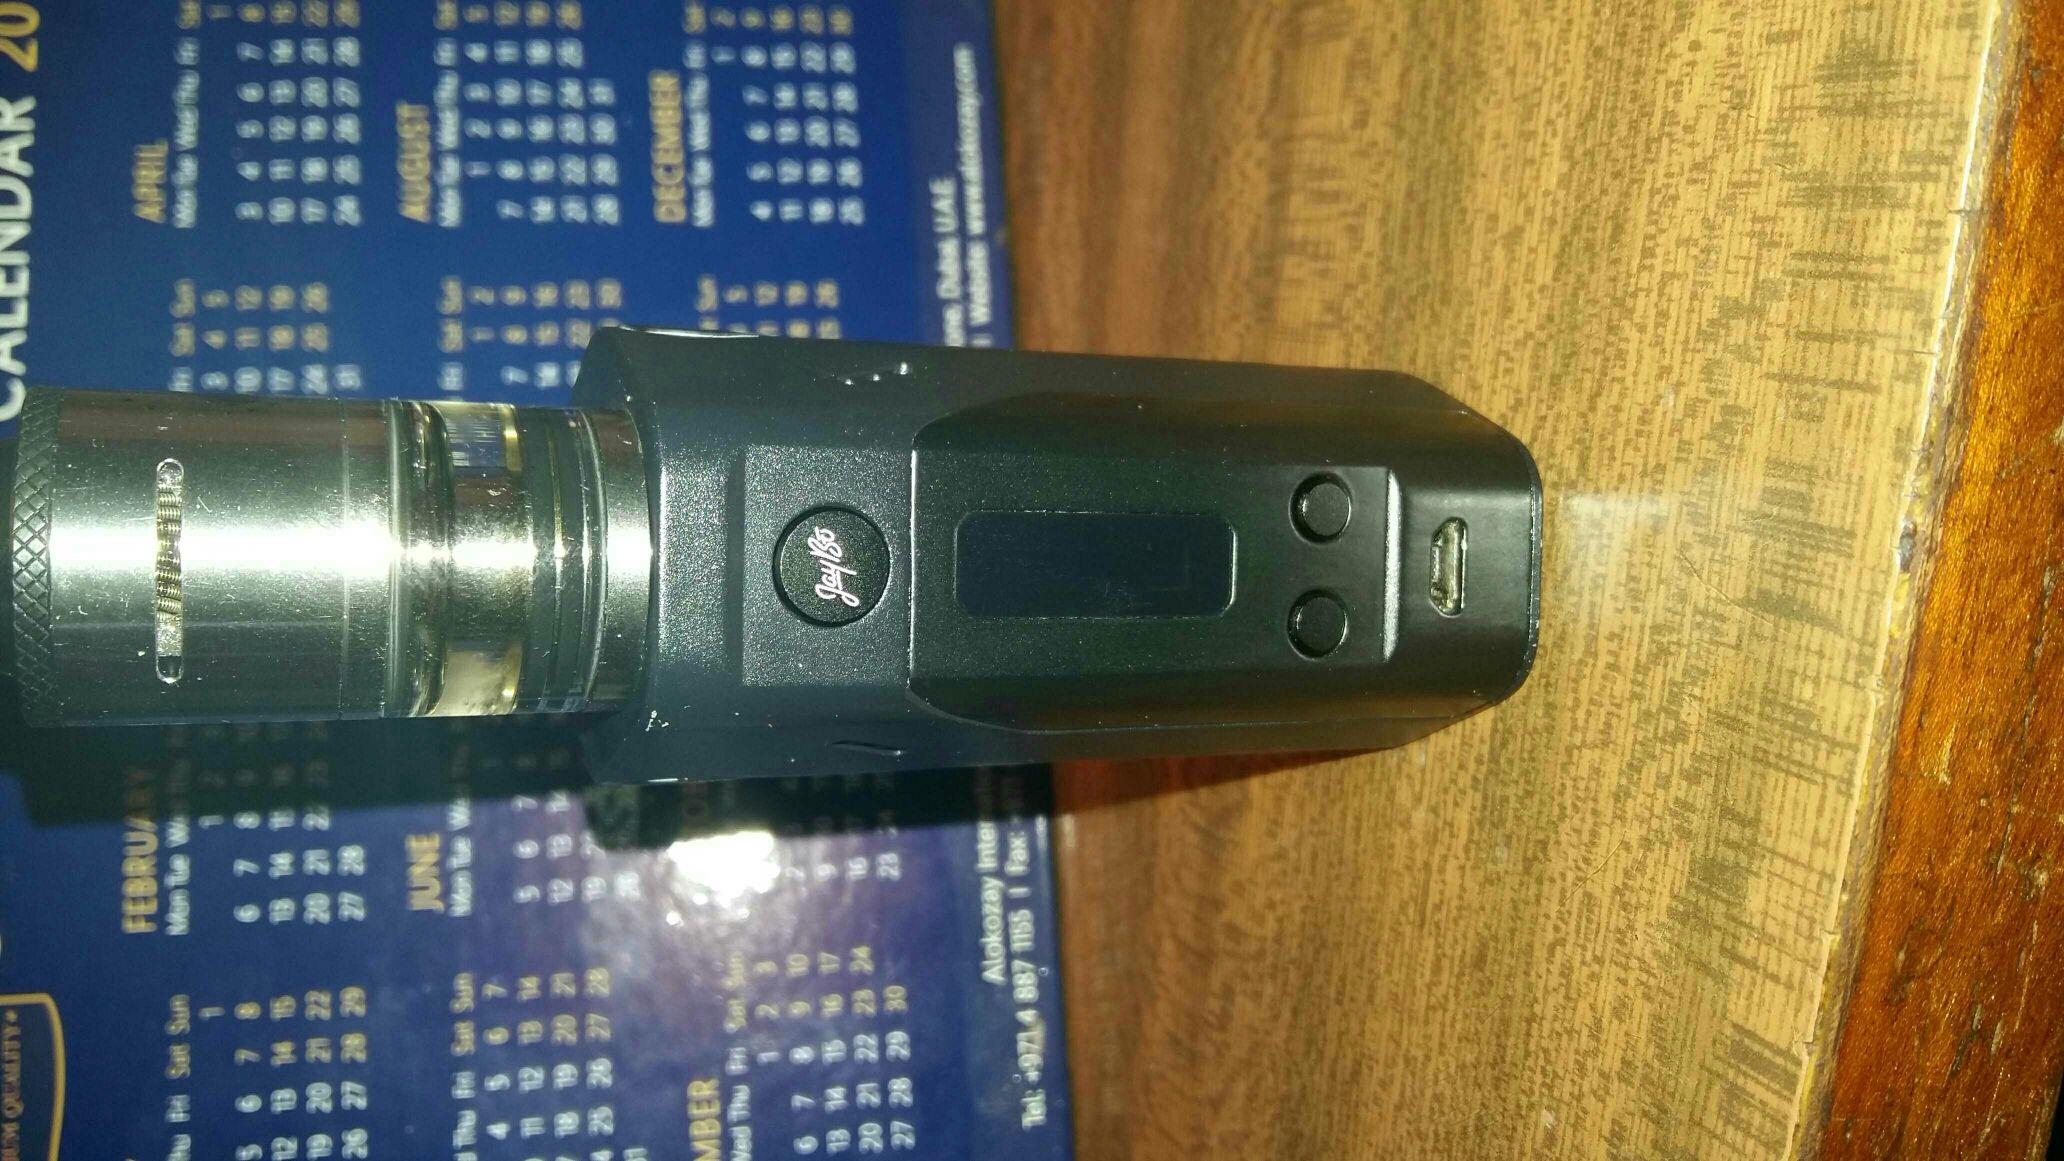 Smok h-priv|Sigelei 150 TC|rx200|Limitless rdta|Hkuda|фрикшоу мини| 662